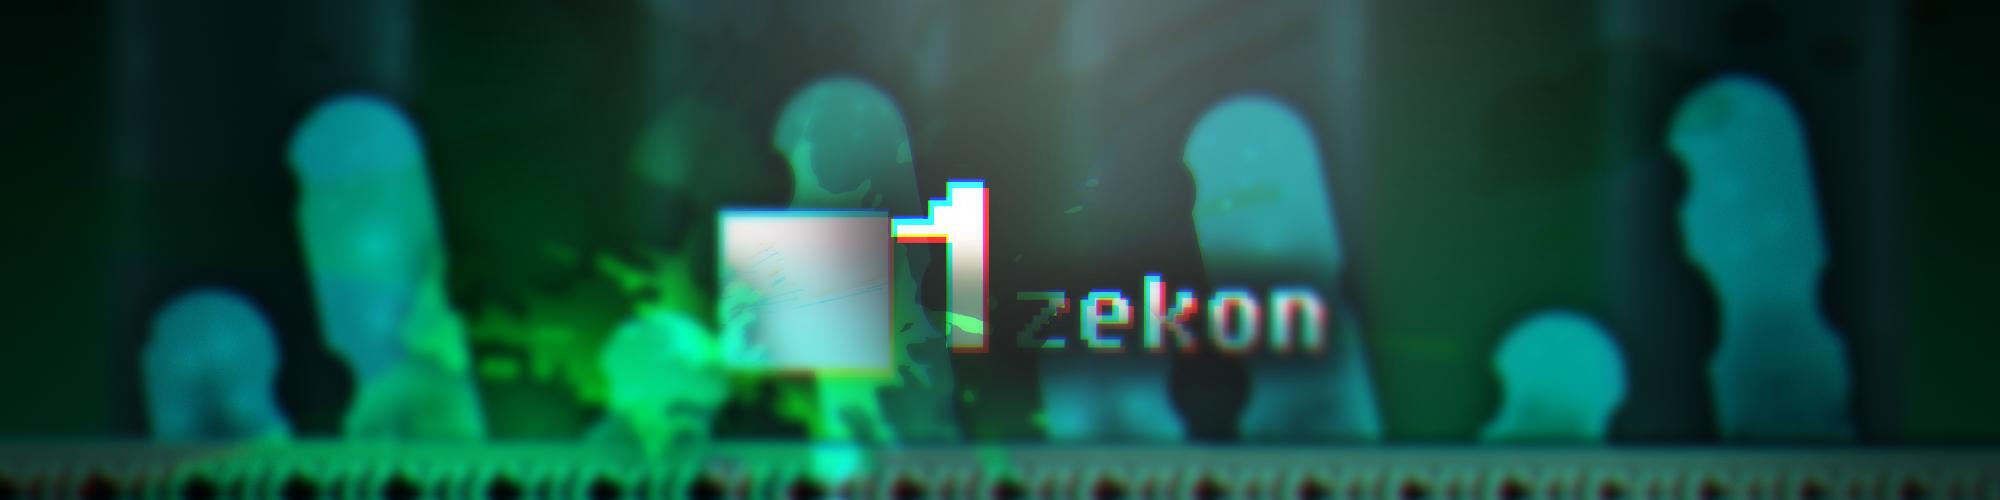 OneZekon